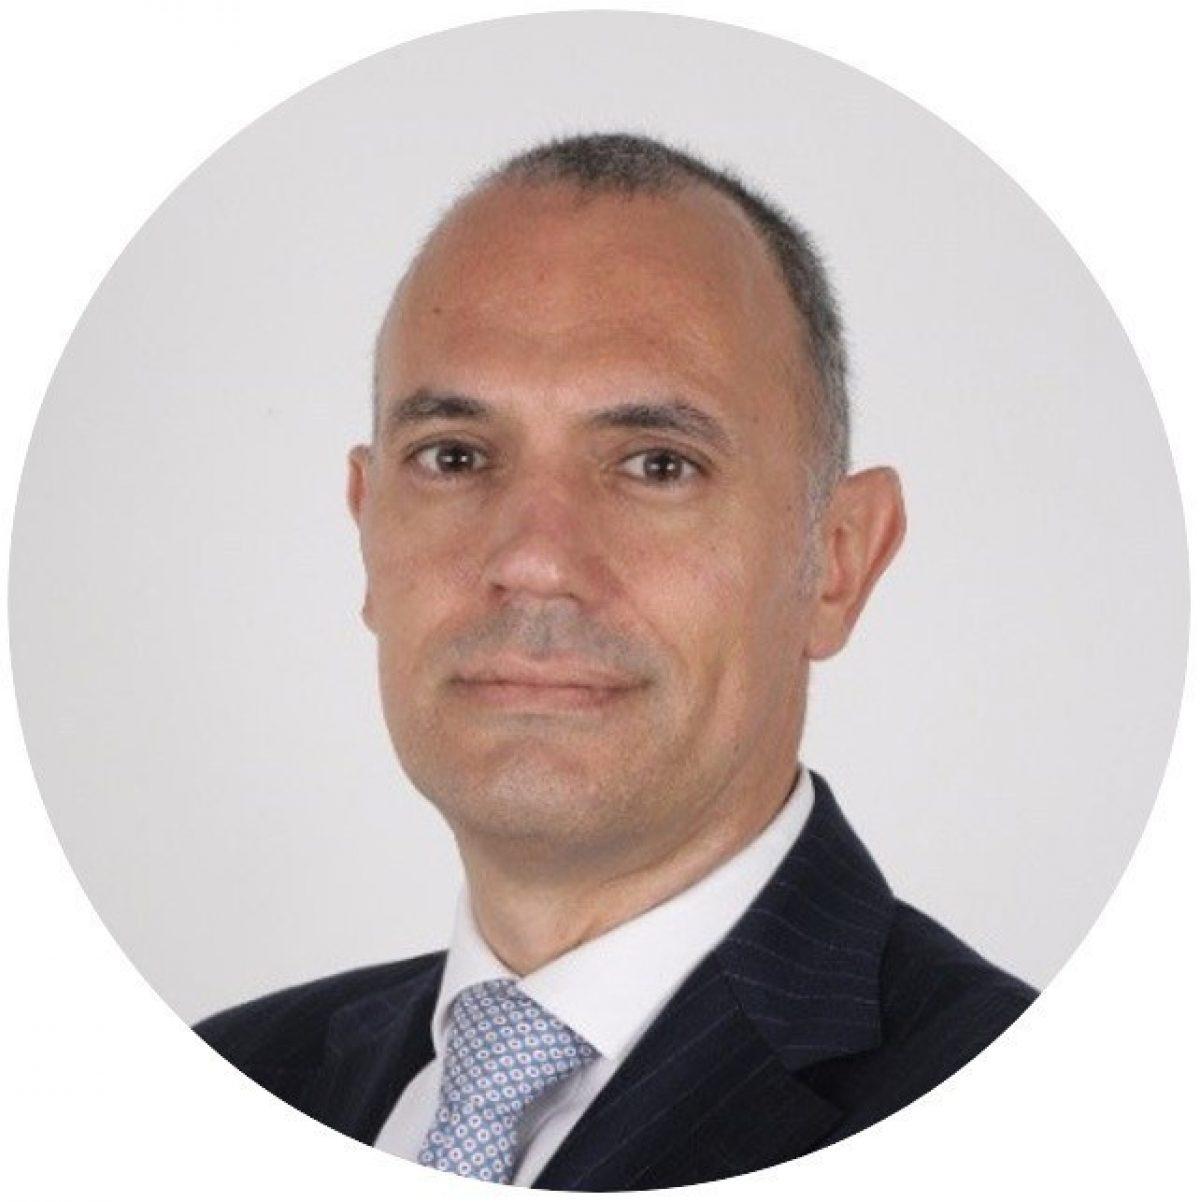 Giorgio Rimini Profile Photo 1 mtime20190614072725